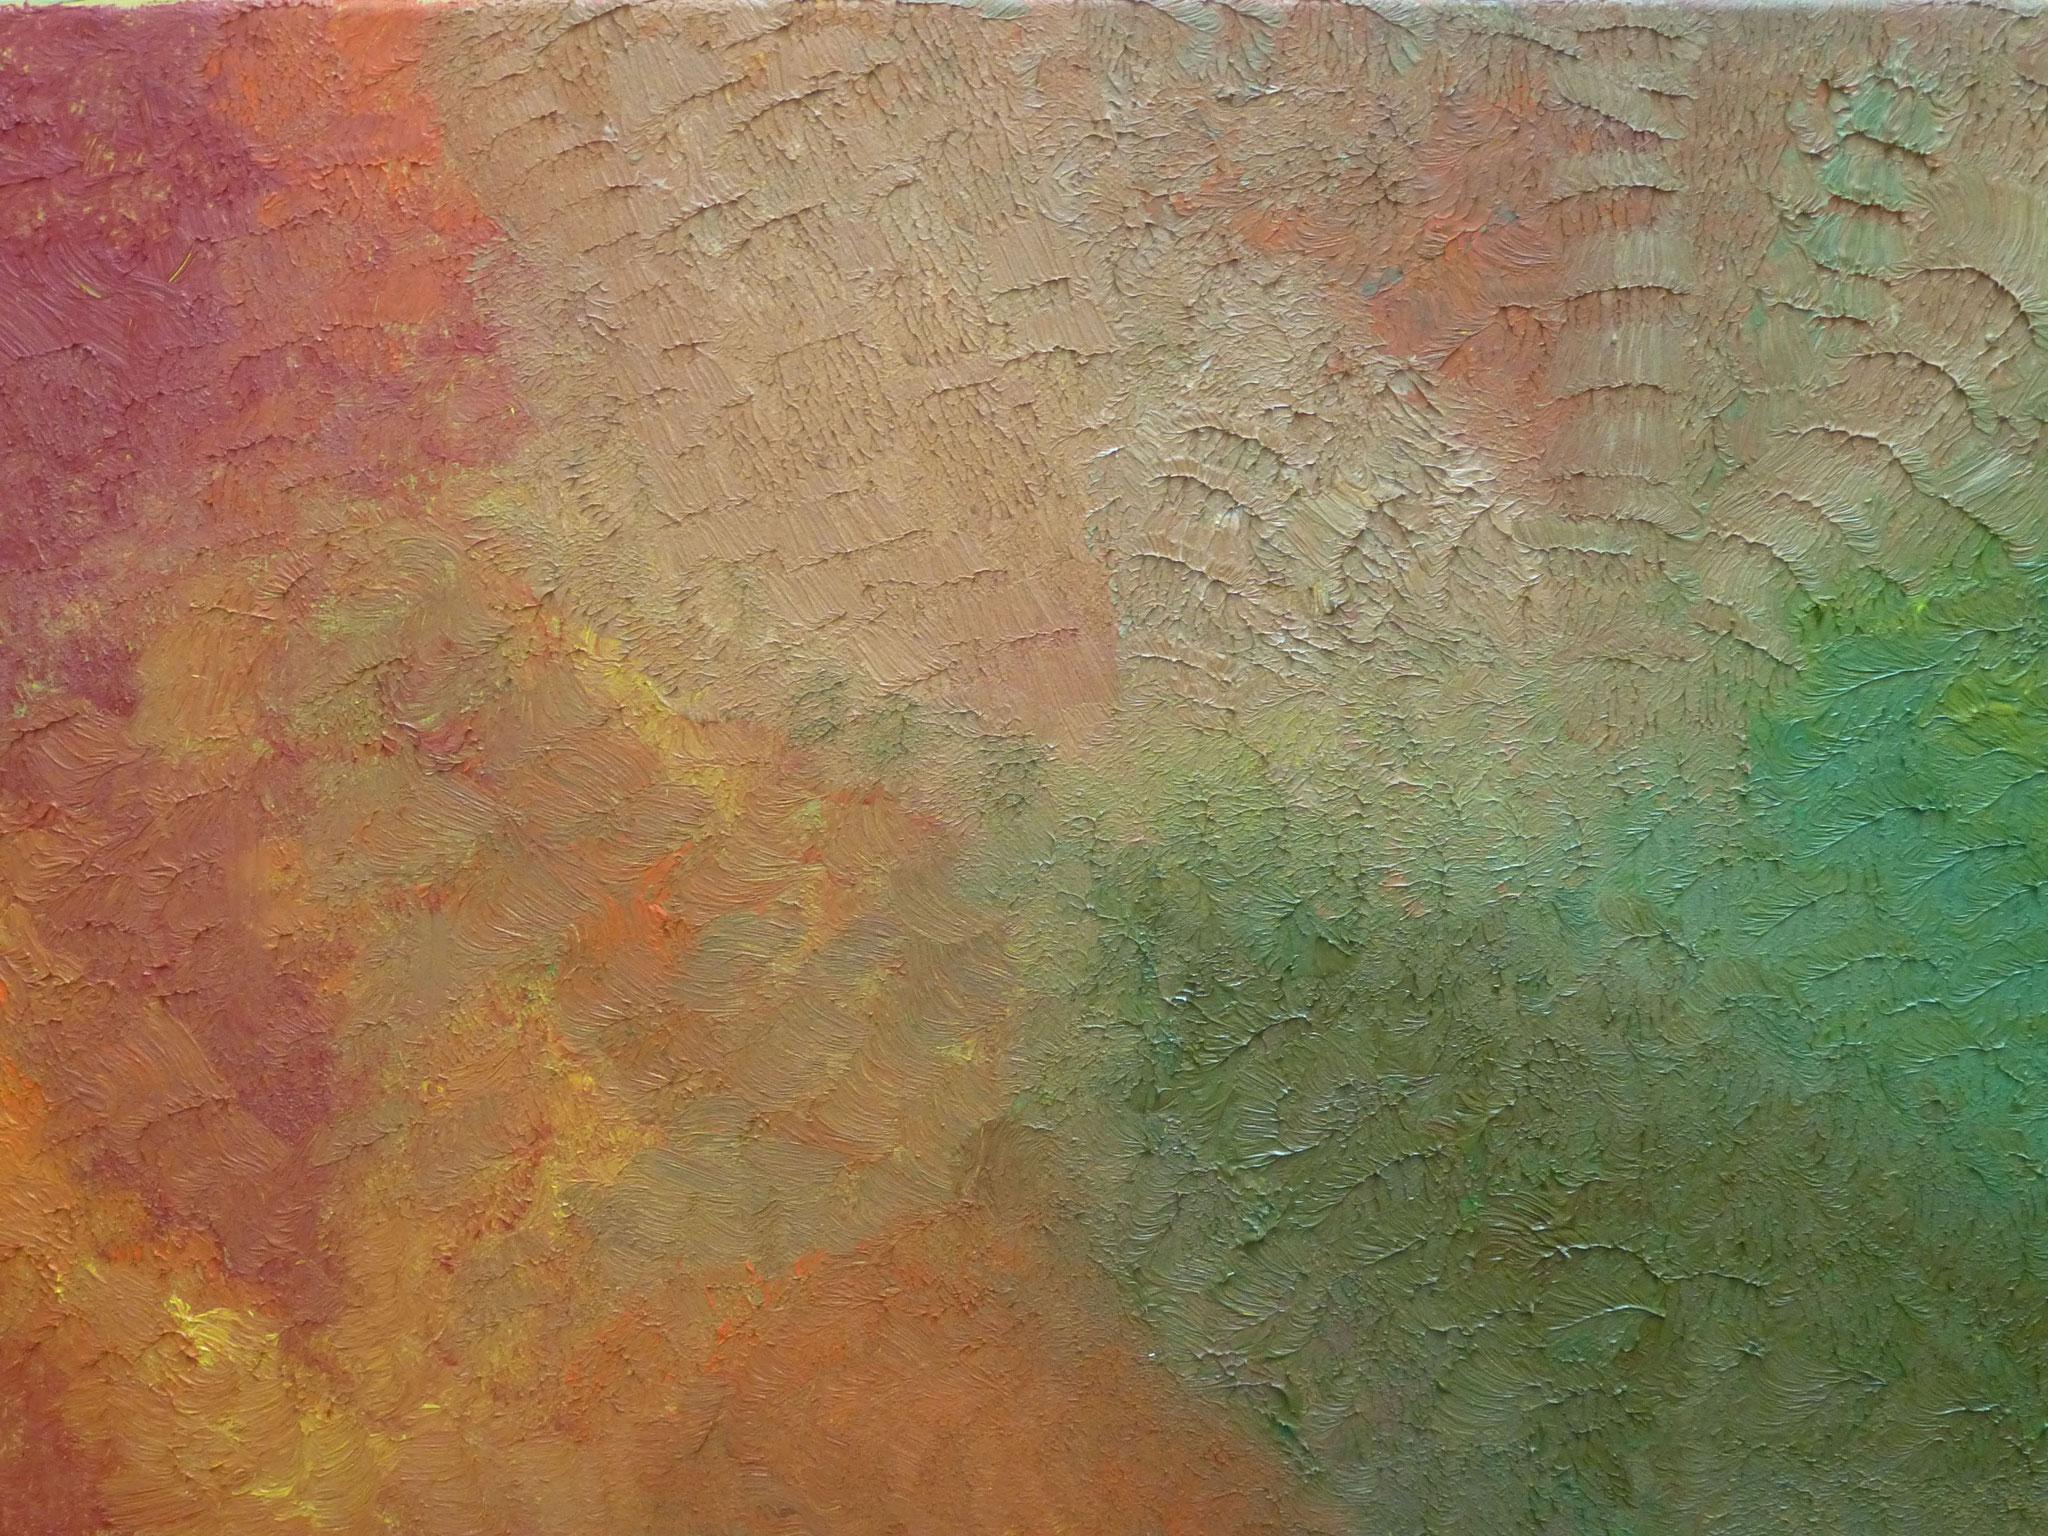 Farbenspiele-2     60 cm x 30 cm